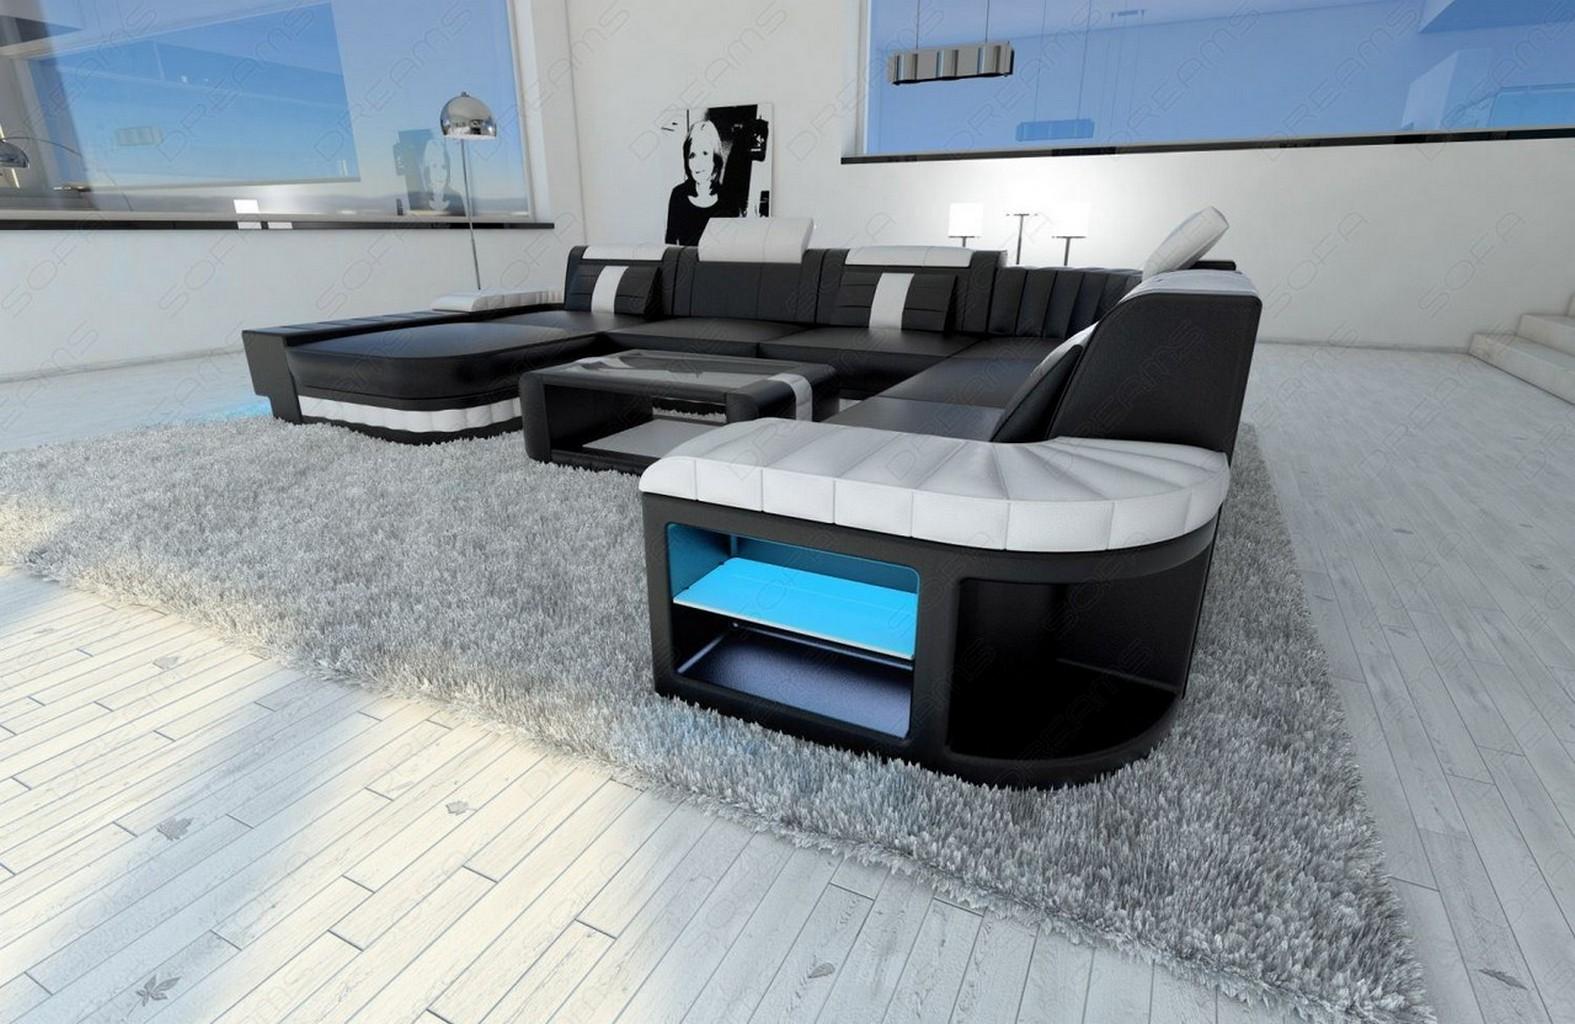 xxl ledercouch affordable sofa billig top big sofa gunstig xxl big sofa ledersofa xxl big sofa. Black Bedroom Furniture Sets. Home Design Ideas